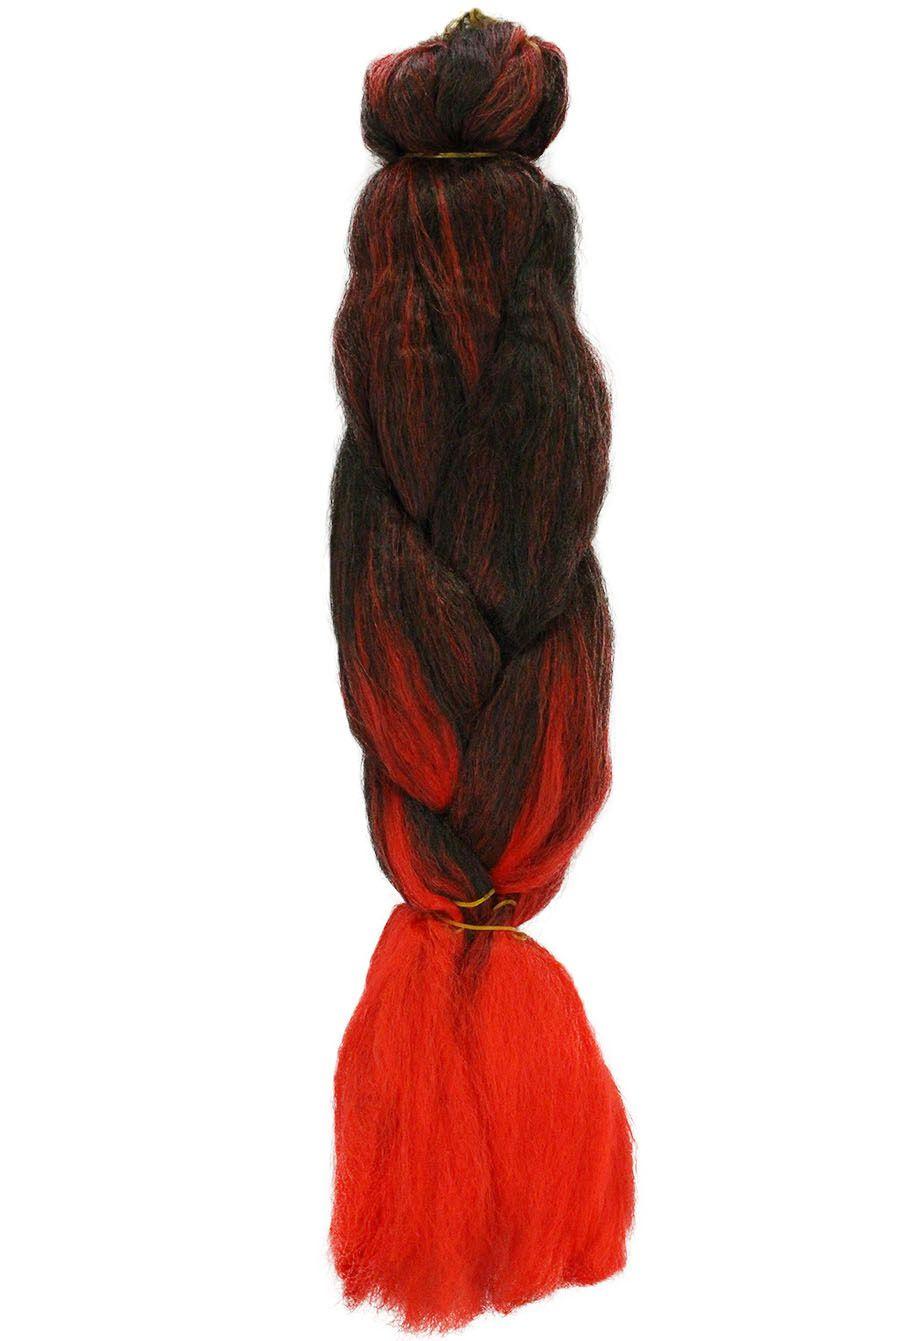 Jumbo - Pacotão Modern Girl (400g) - Cor: Preto/Vermelho (T1B/RED)